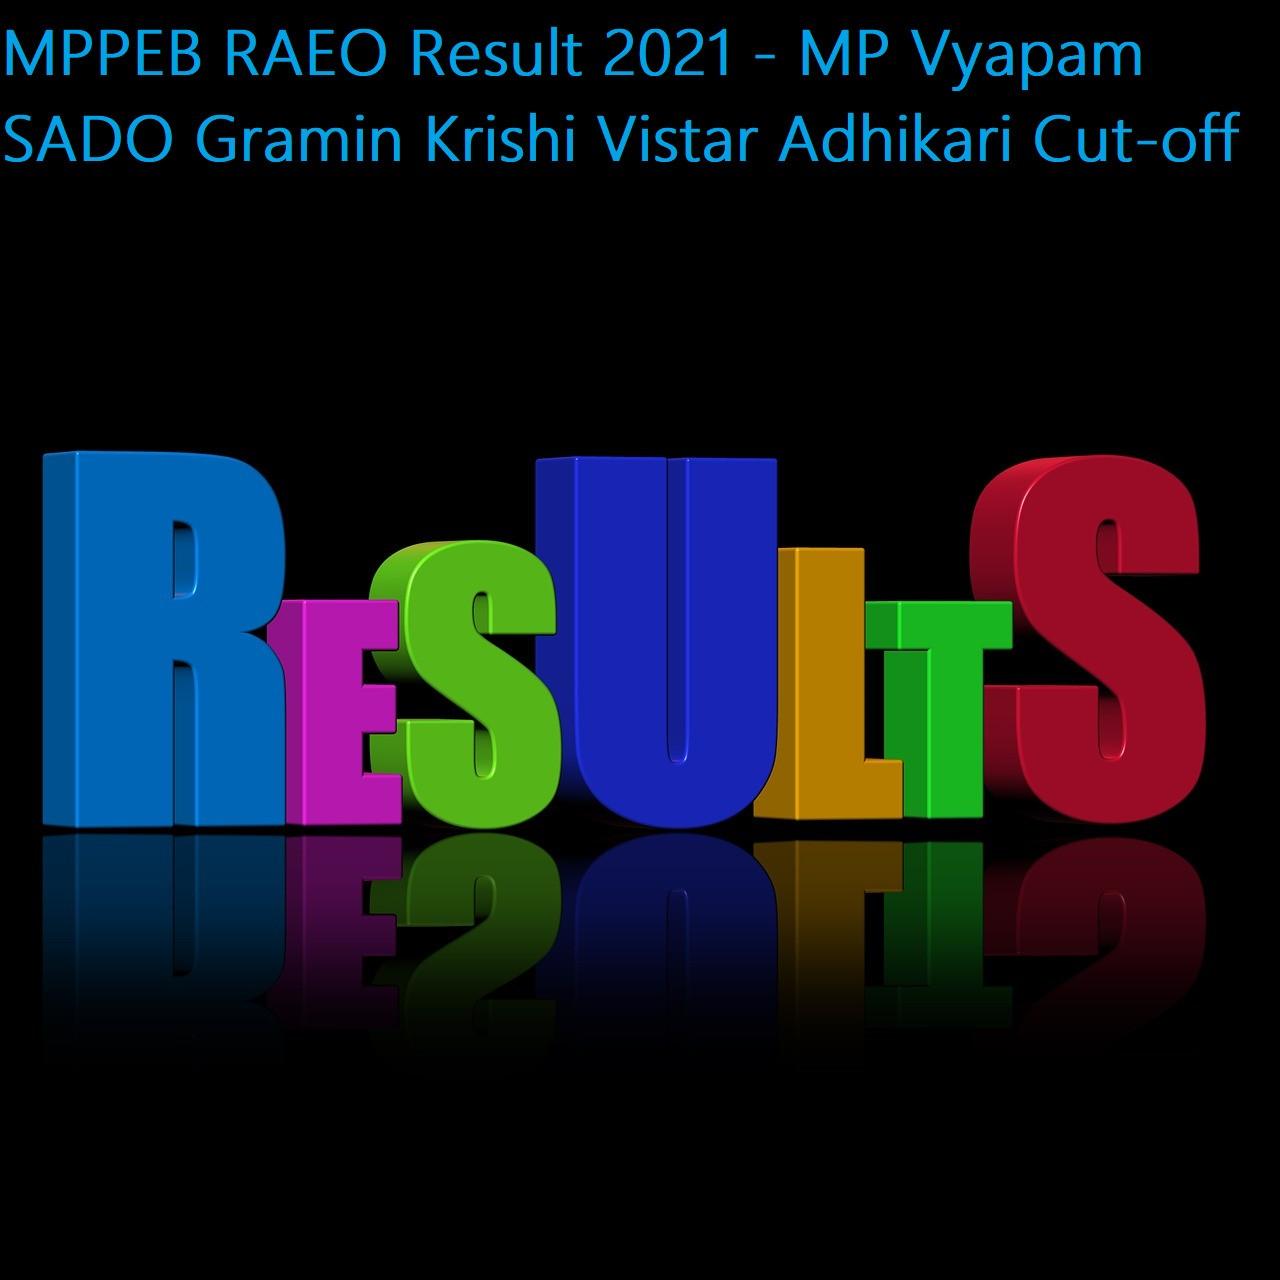 MPPEB RAEO Result